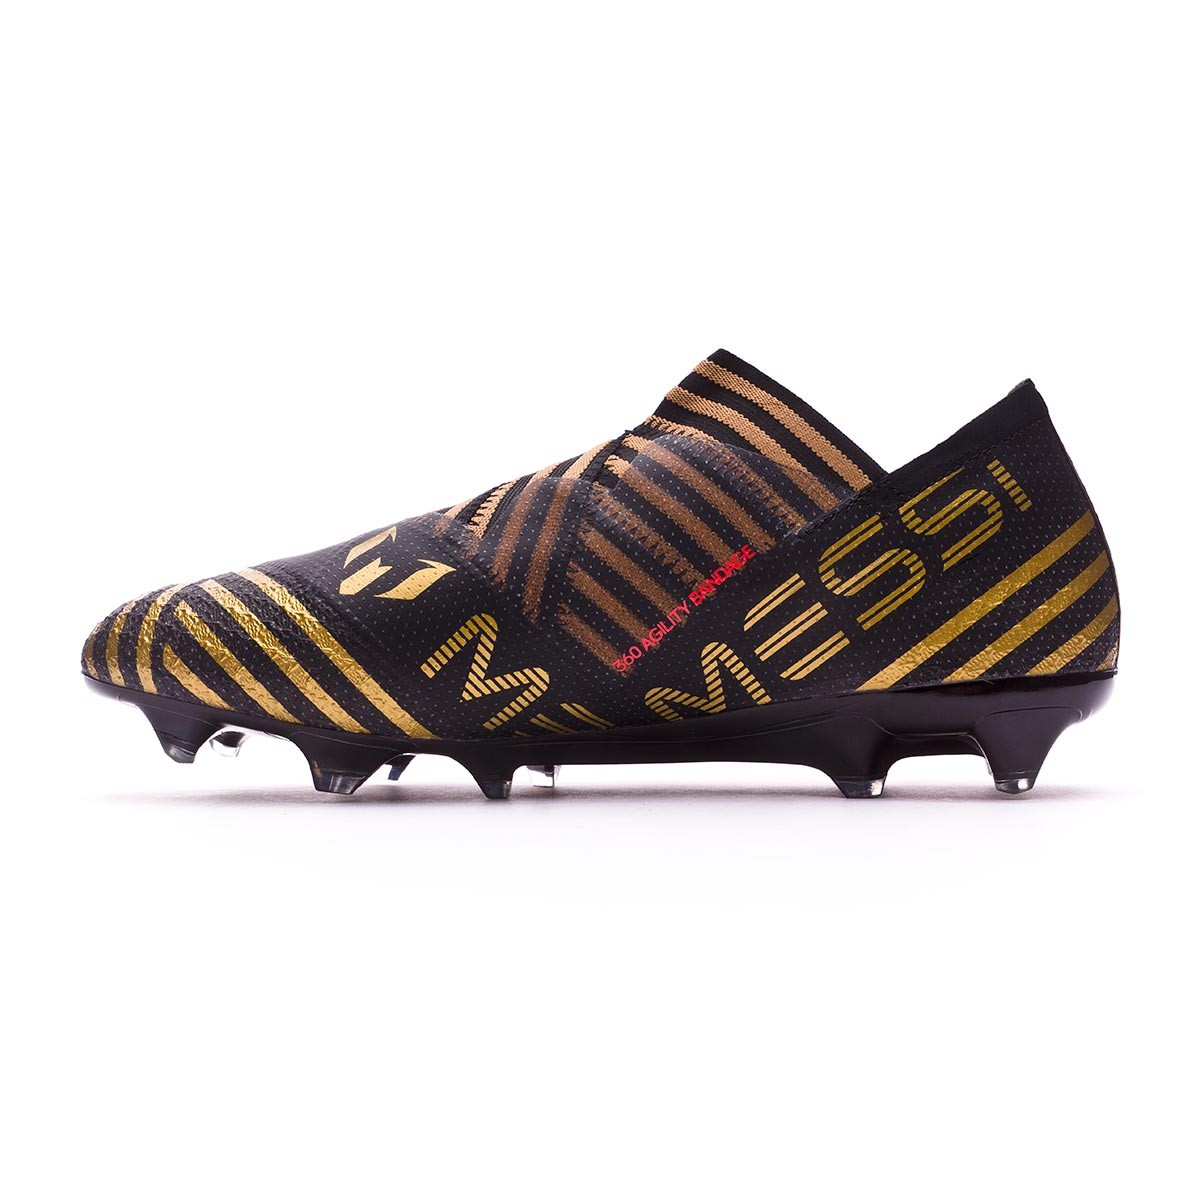 87c4d2d18b12 Football Boots adidas Nemeziz Messi 17+ 360 Agility FG Core black-Solar  red-Tactile gold metallic - Football store Fútbol Emotion